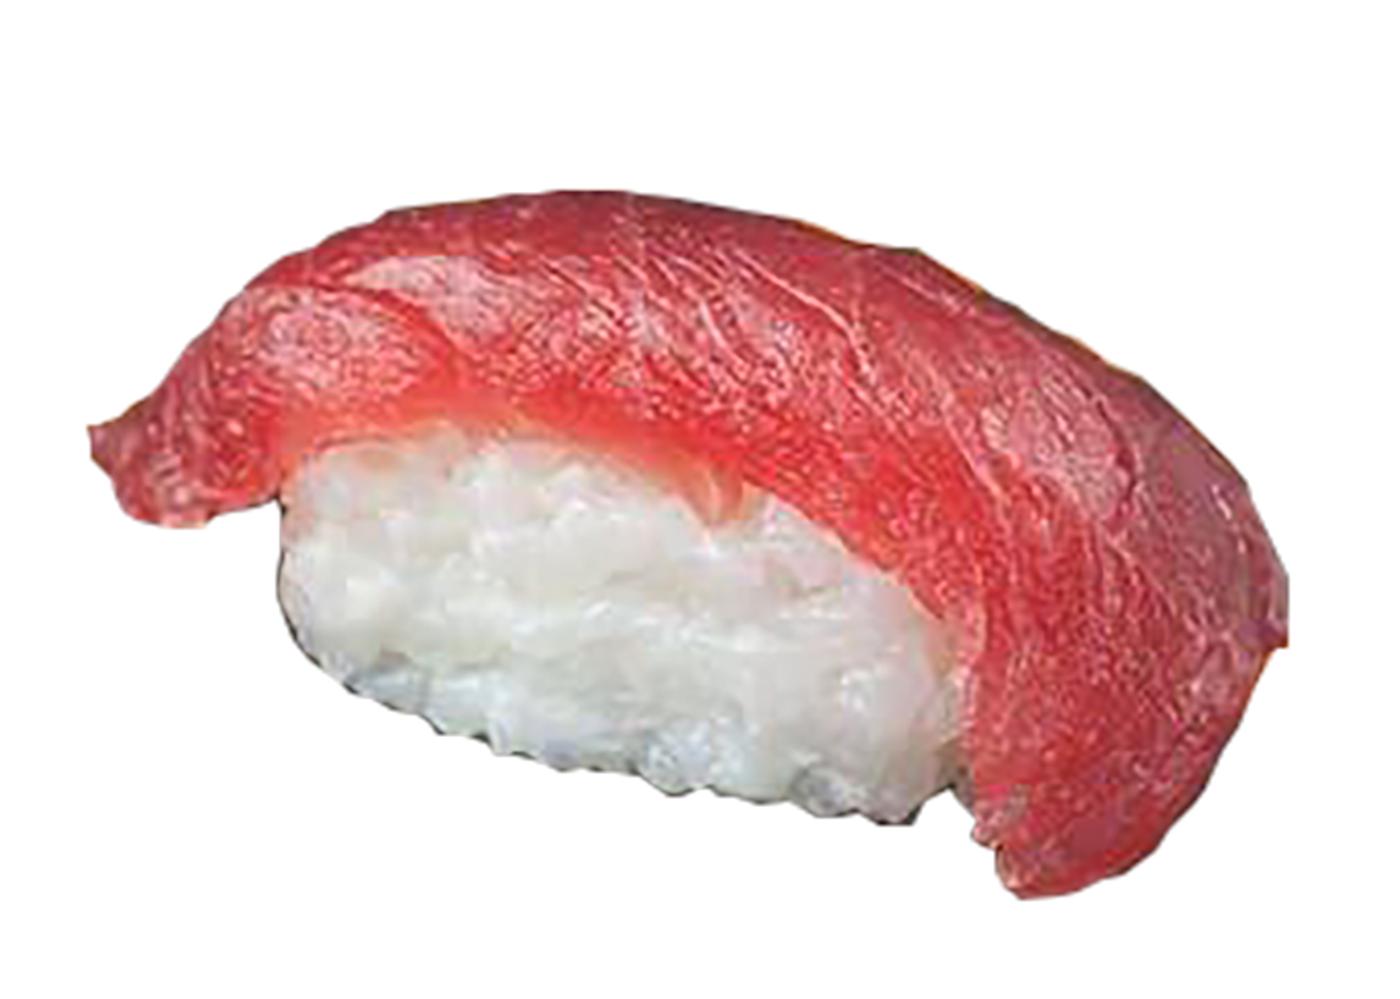 Productafbeelding SUSHI NIGIRI TONIJN YELLOWFIN PER STUK